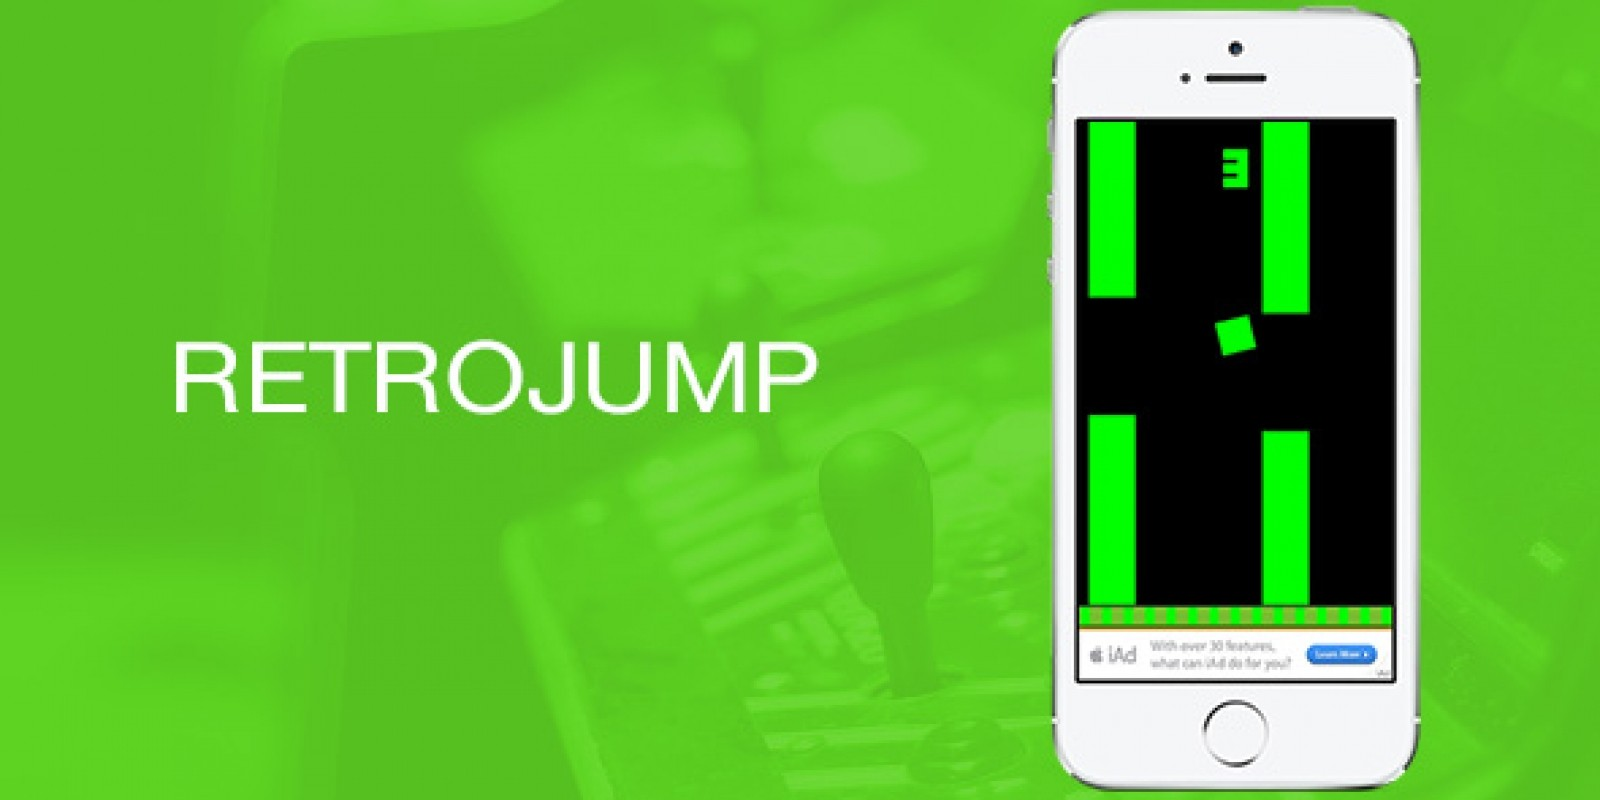 RetroJump iOS Game Source Code